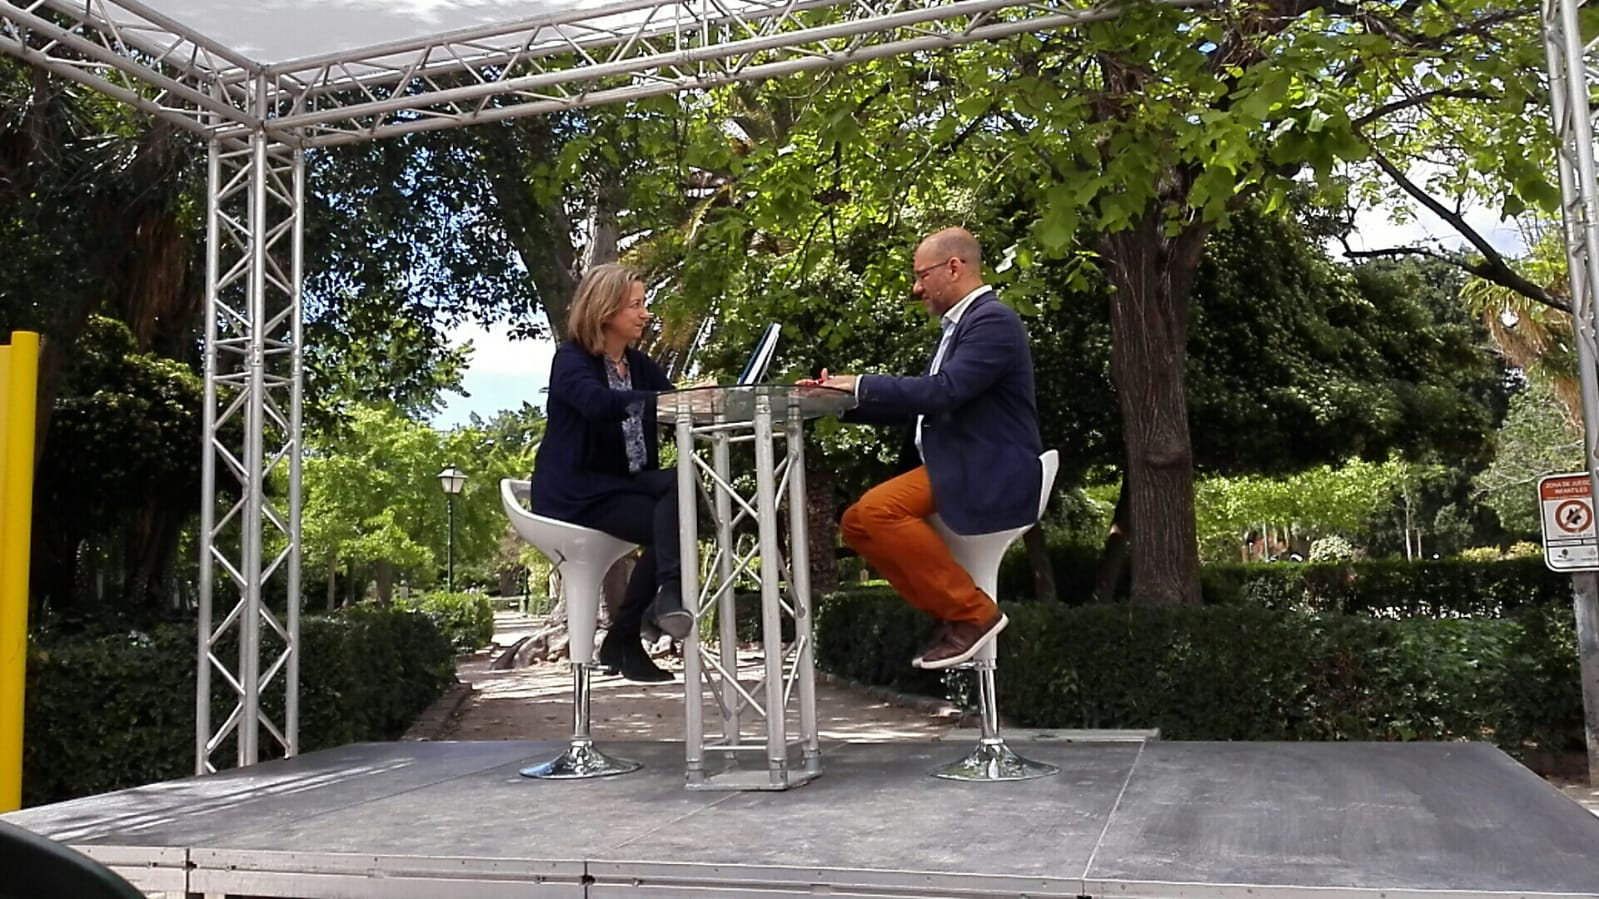 Entrevista-TV-Feriadellibro-Valencia-FelicidadTendencial